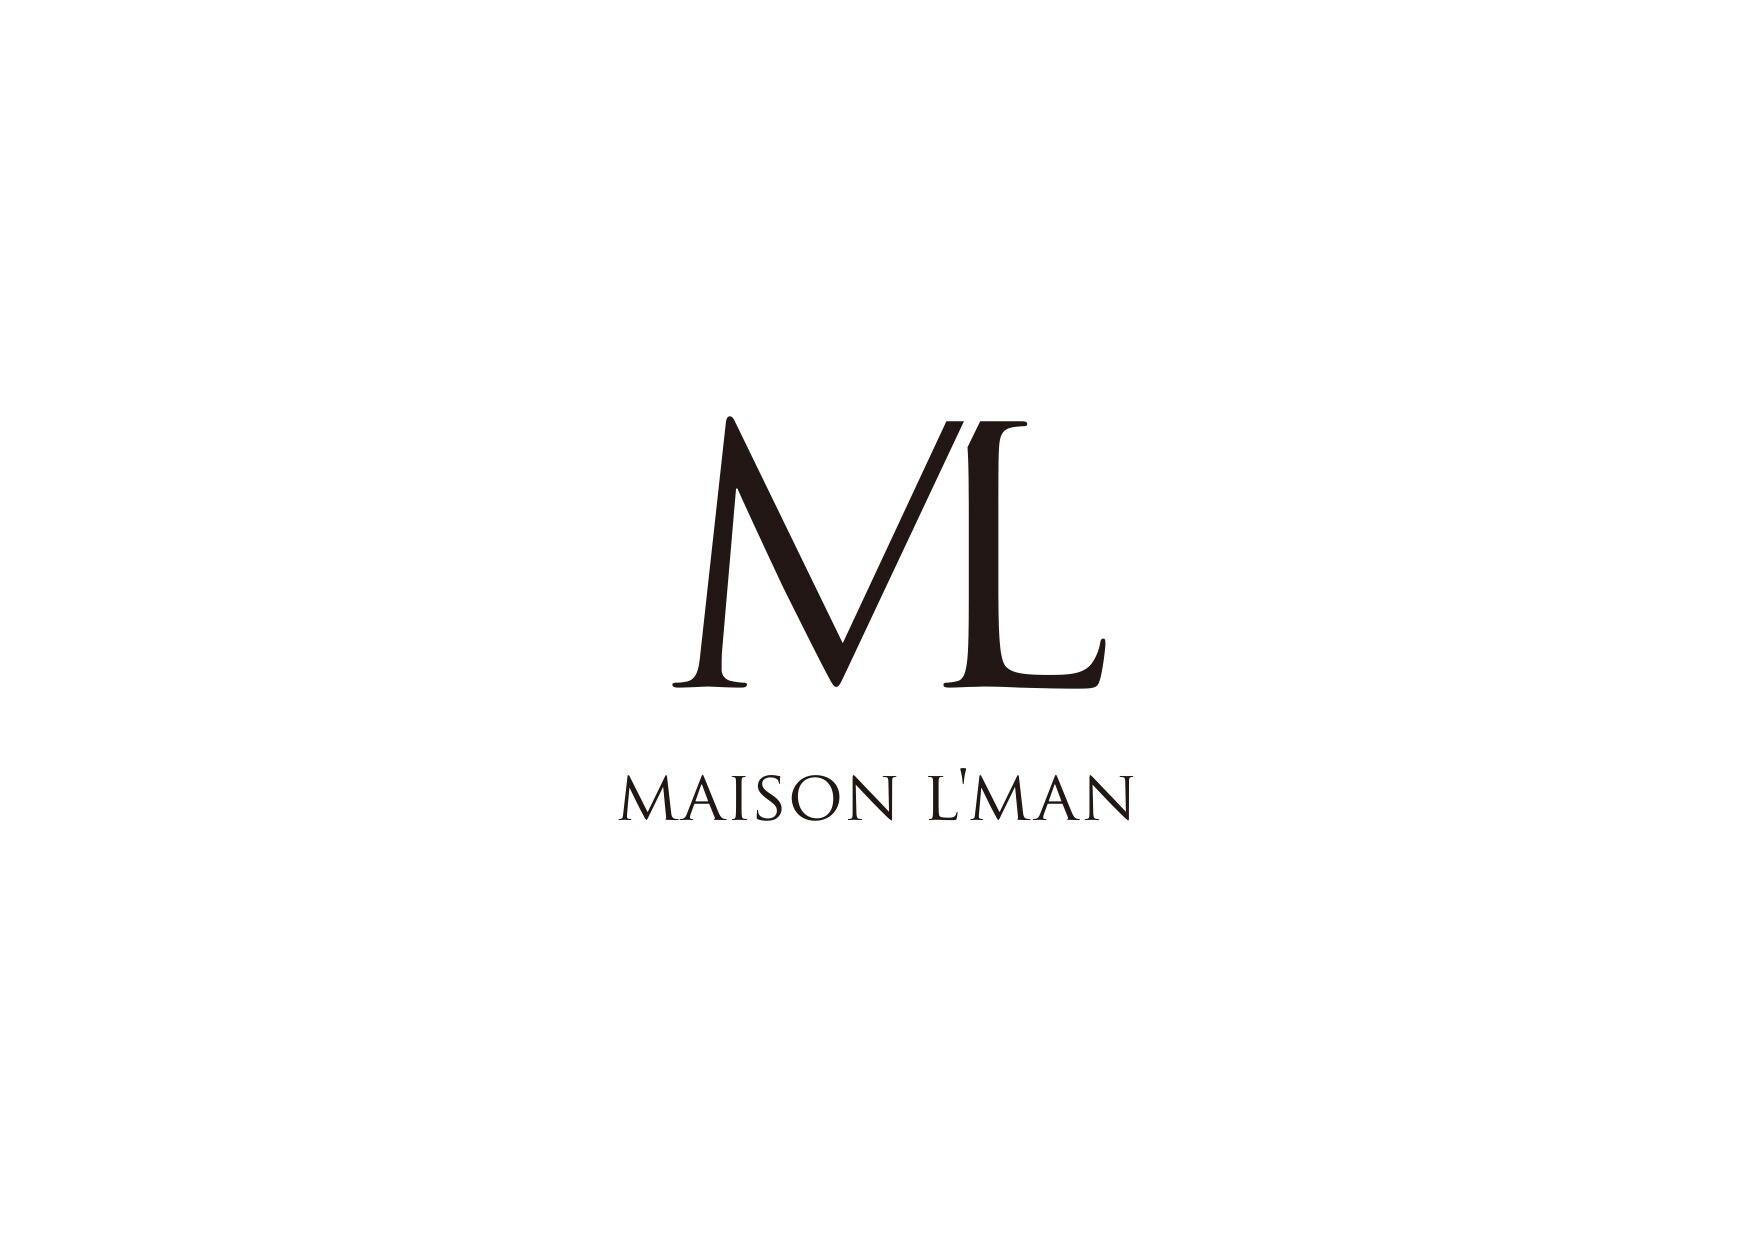 Maison L'man『メゾンロマン』